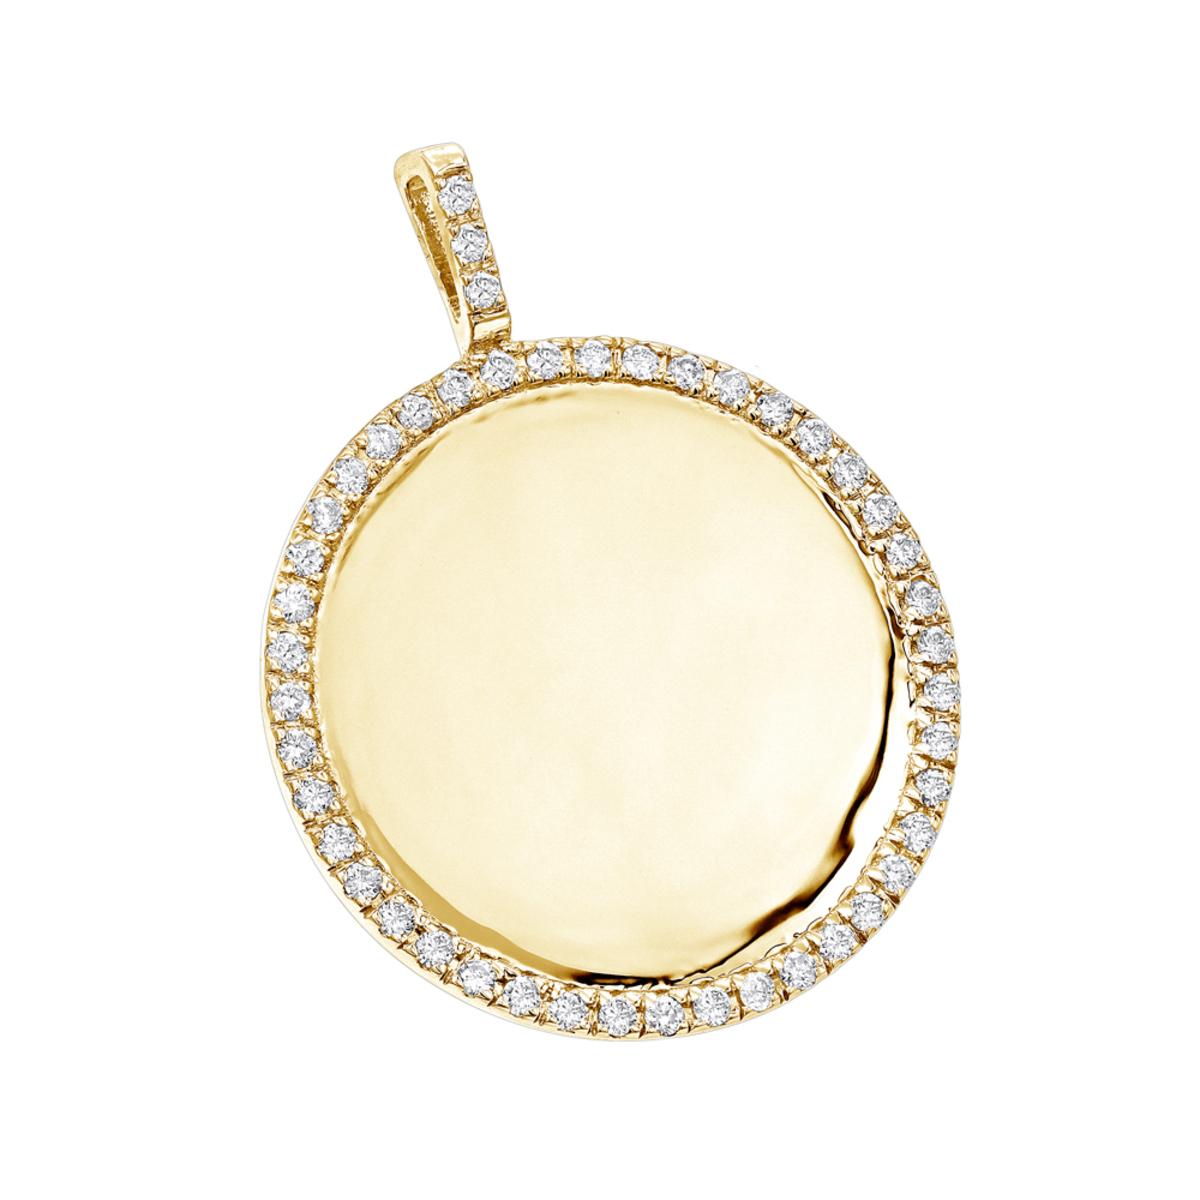 14K Gold Diamond Circle Medallion Pendant for Women 0.5ct by Luxurman